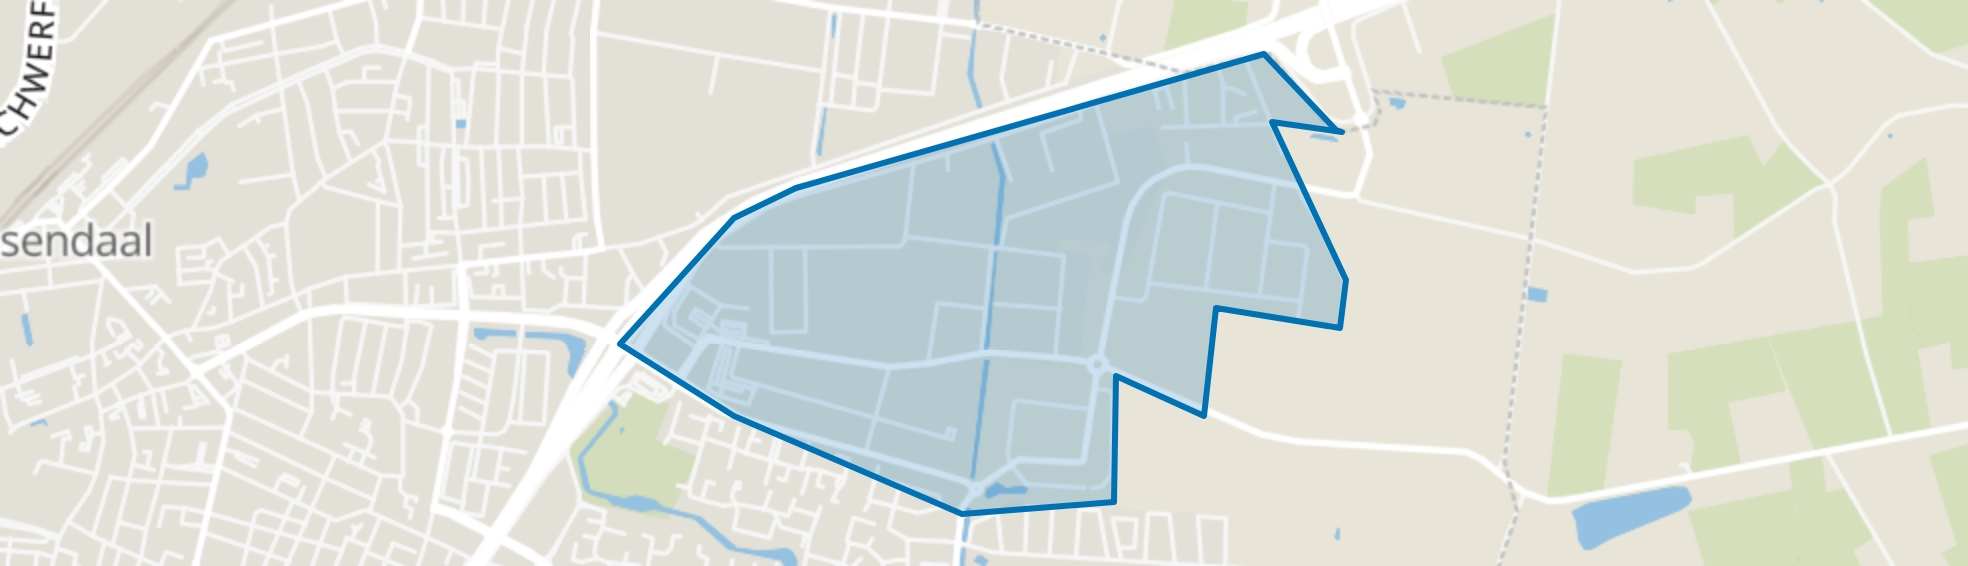 Majoppeveld-Zuid, Roosendaal map